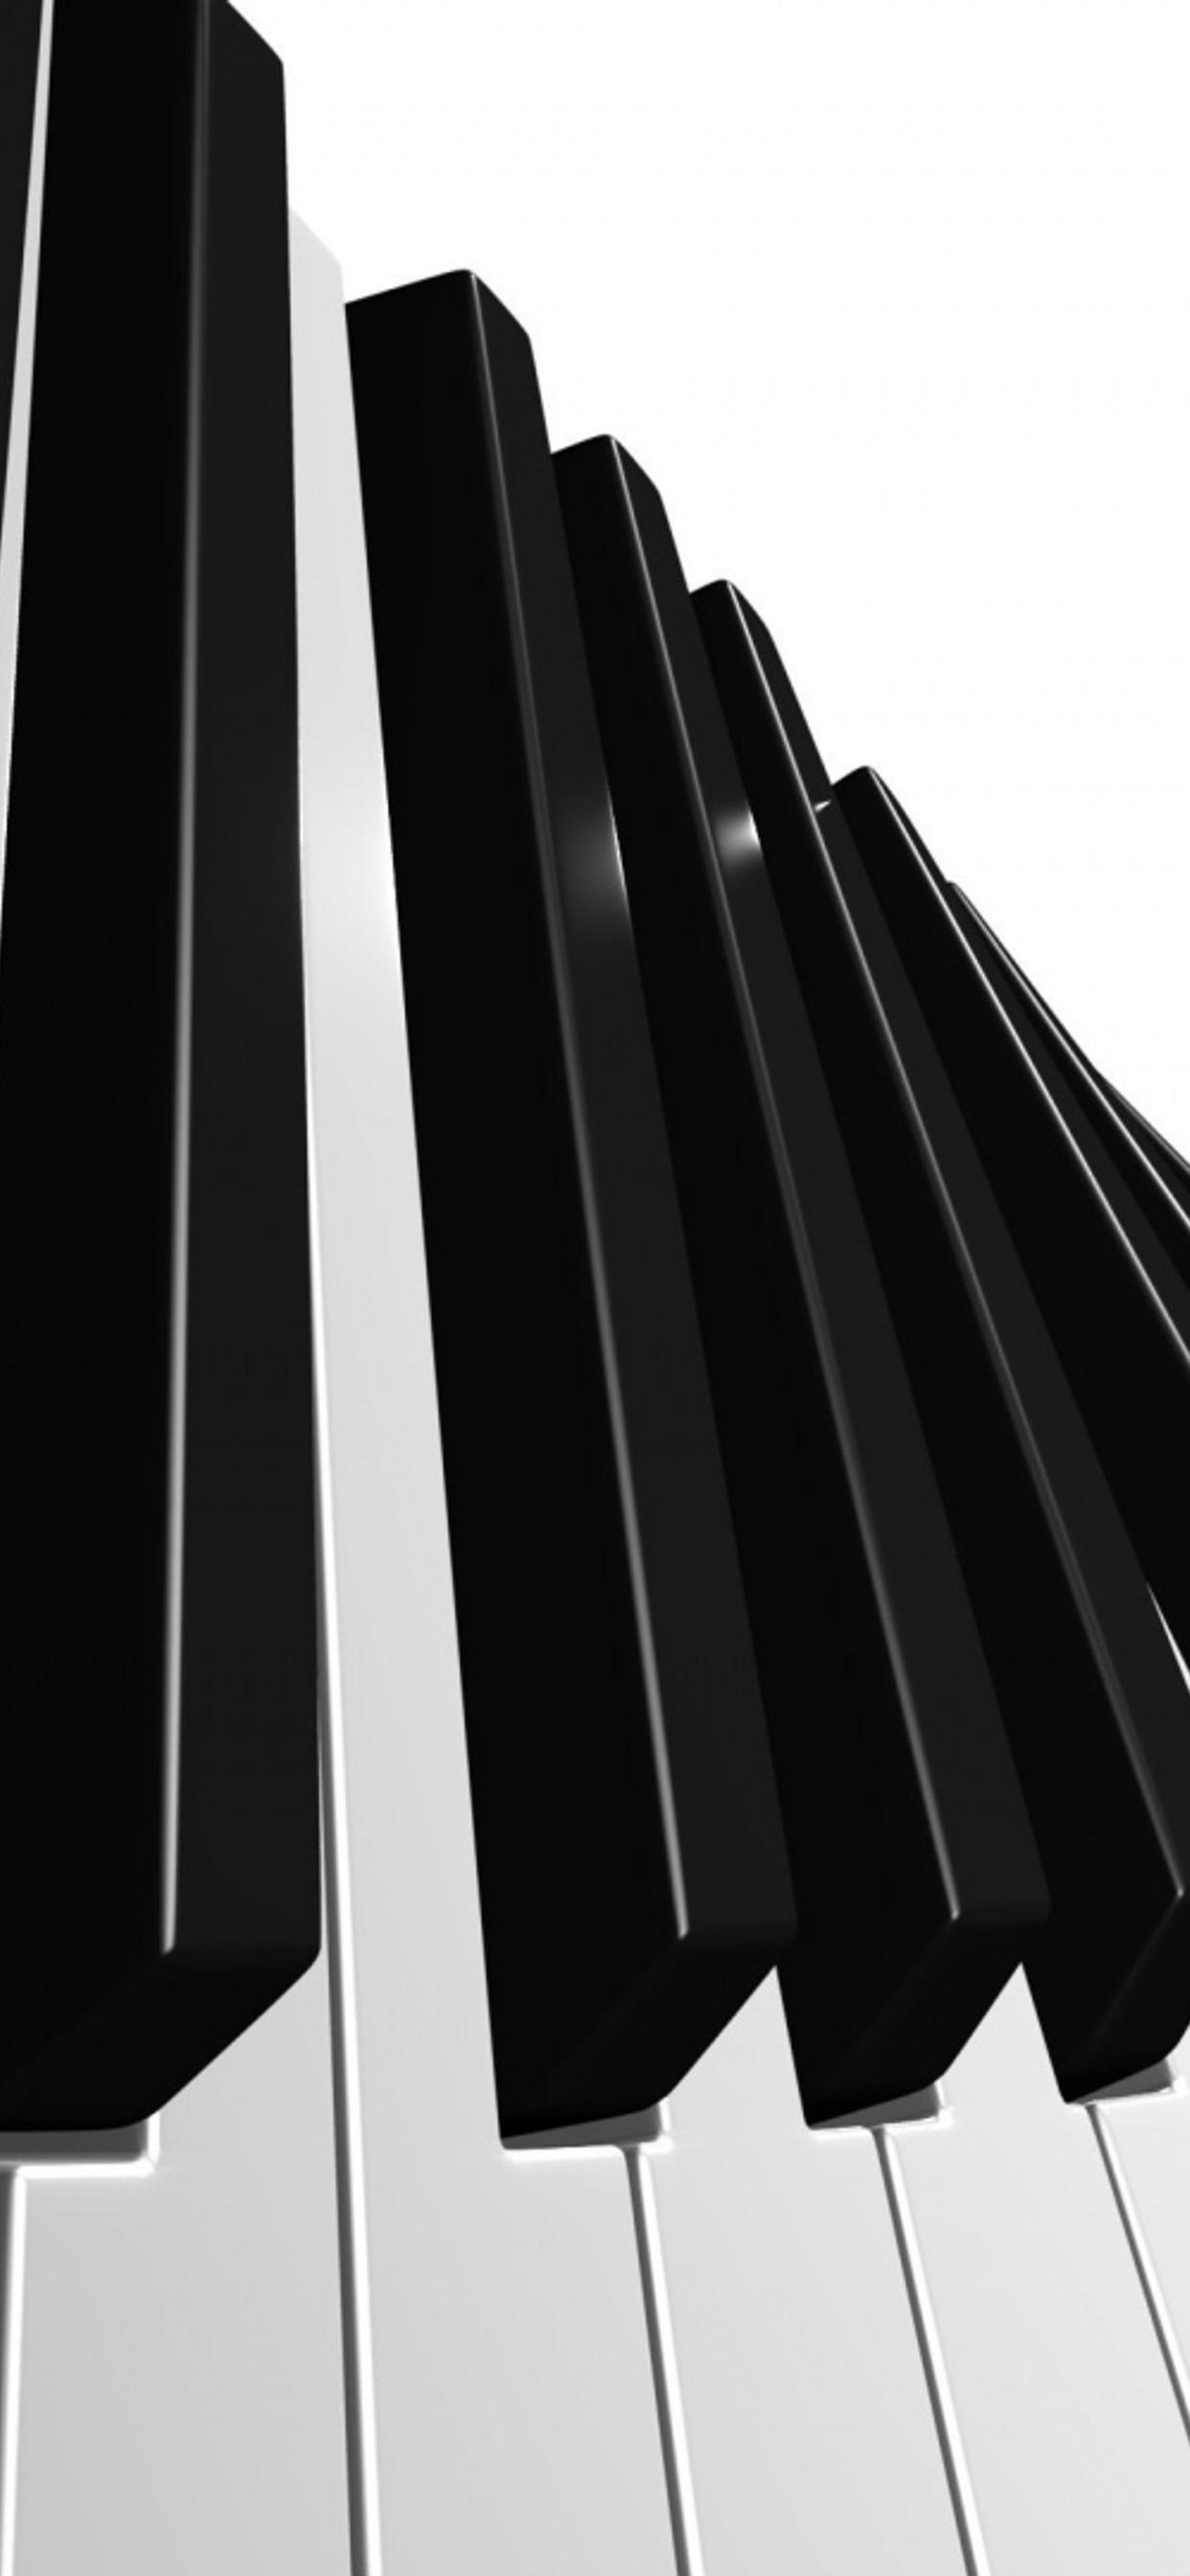 Abstract Piano Keys White And Black Wallpaper